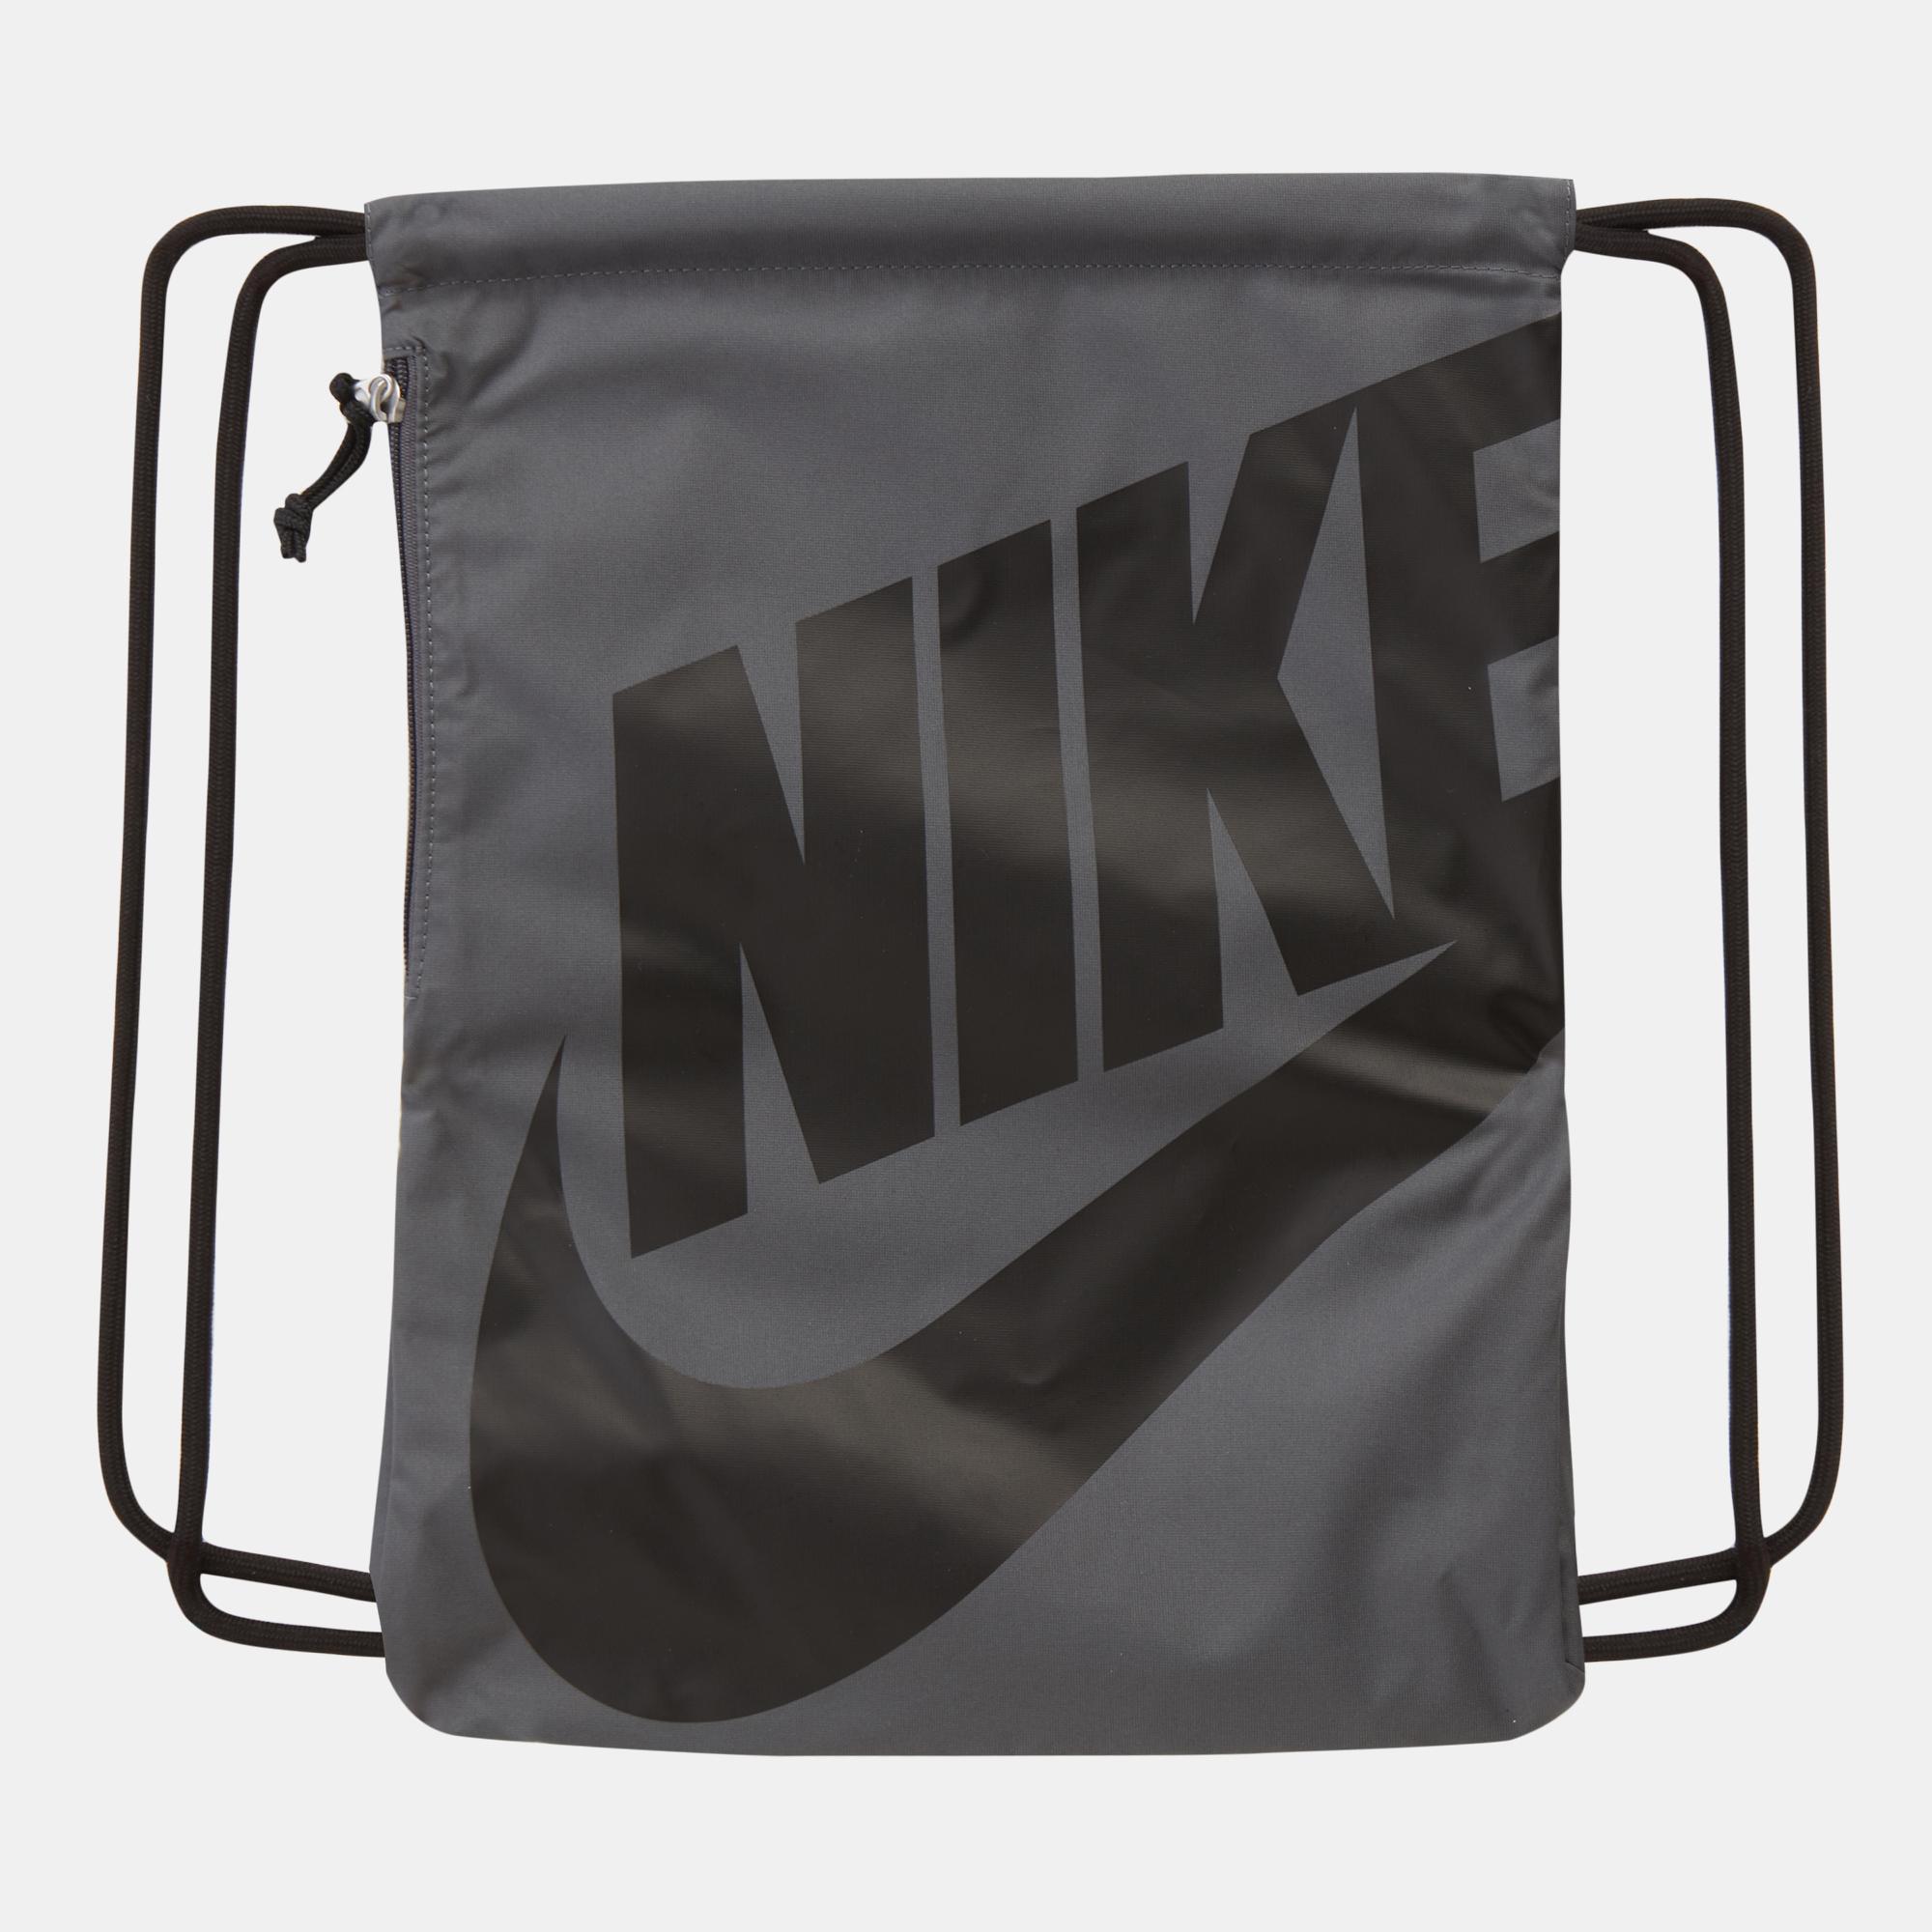 00d8a1871 Nike Sportswear Heritage Gymsack | Backpacks and Rucksacks | Bags ...